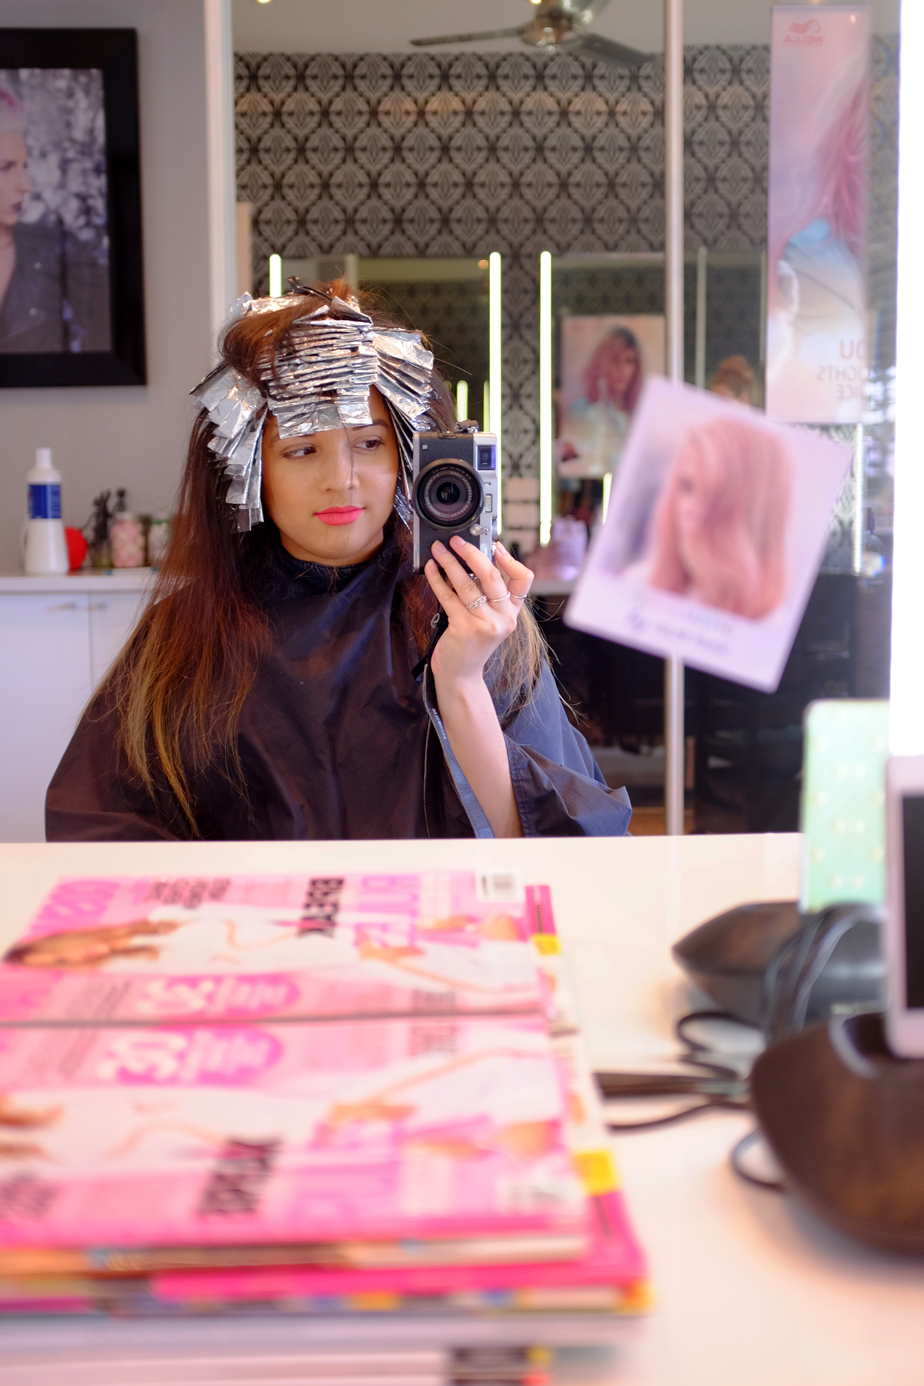 hair by rebecca louise, rebecca louise hair, hairstyle, hair inspo, instahair, ombre, rose gold hair, hair trend, corrimal east hair, sydney hair, sydney blogger, blogger, fashion blogger, style, beauty, stylish, sponsored, long hair, hair tips, makeup, sydney hairdresser, hairdresser